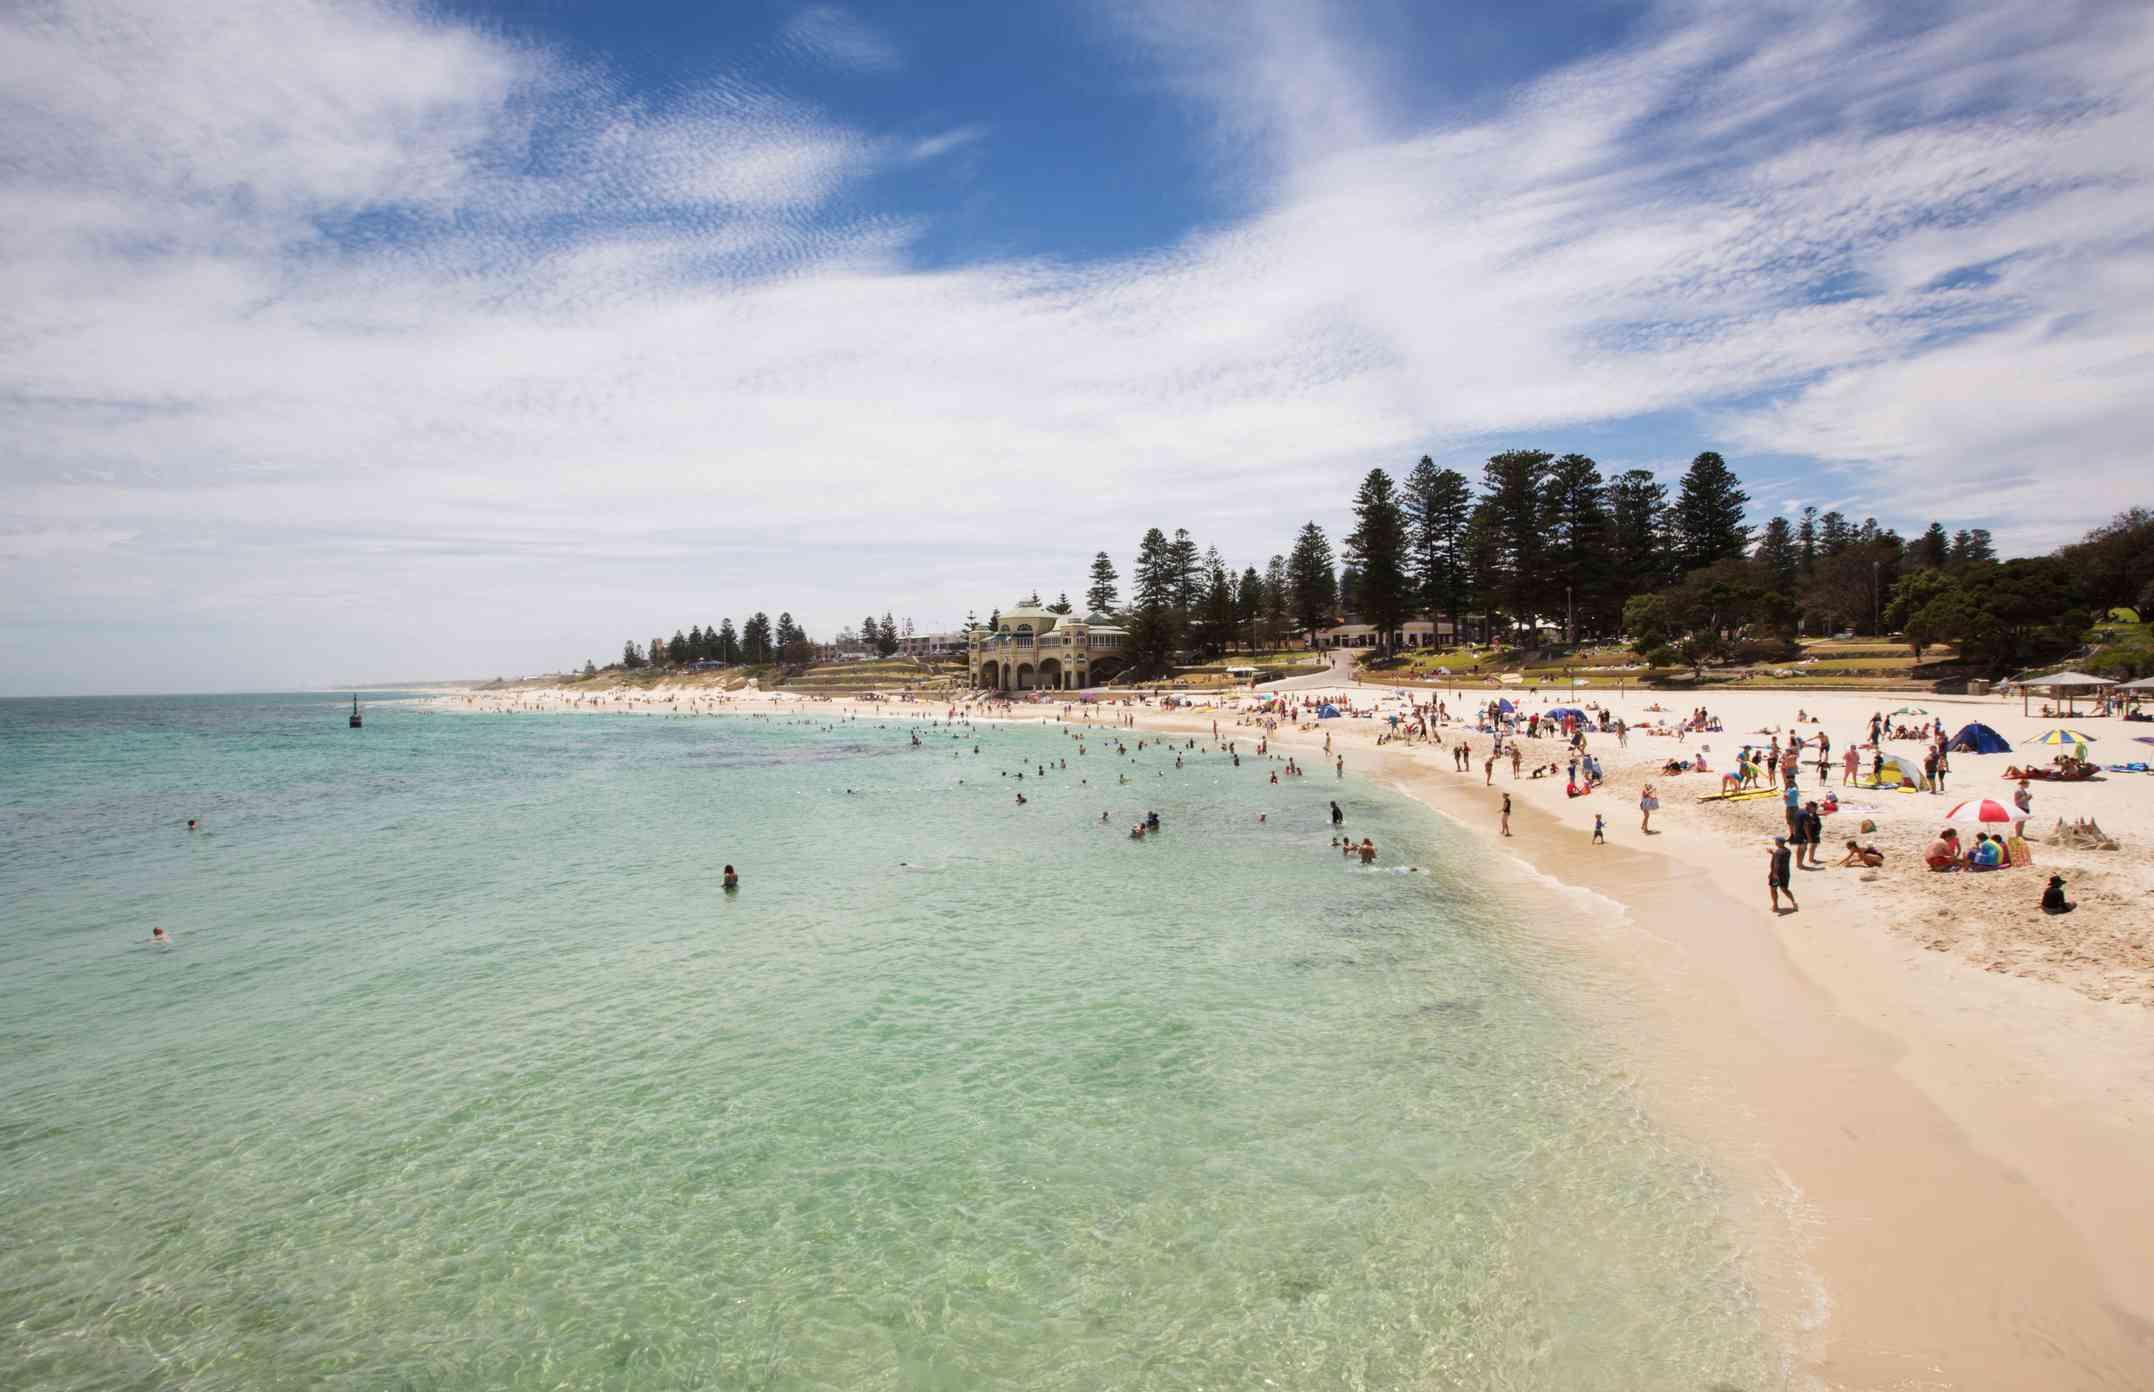 People enjoying Cottesloe Beach